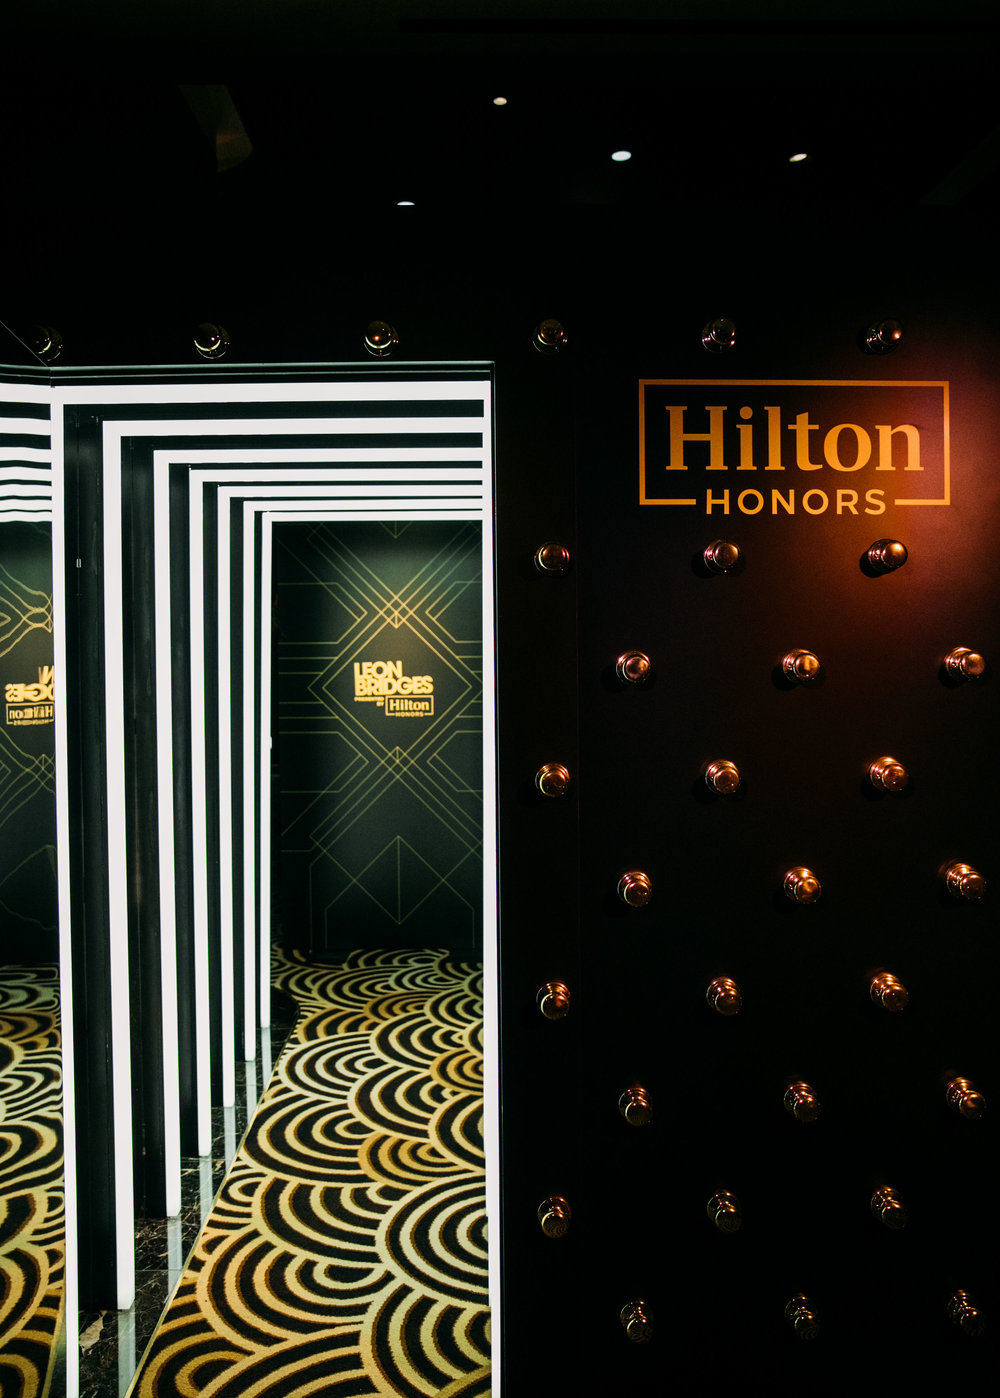 HiltonH_0430.jpg